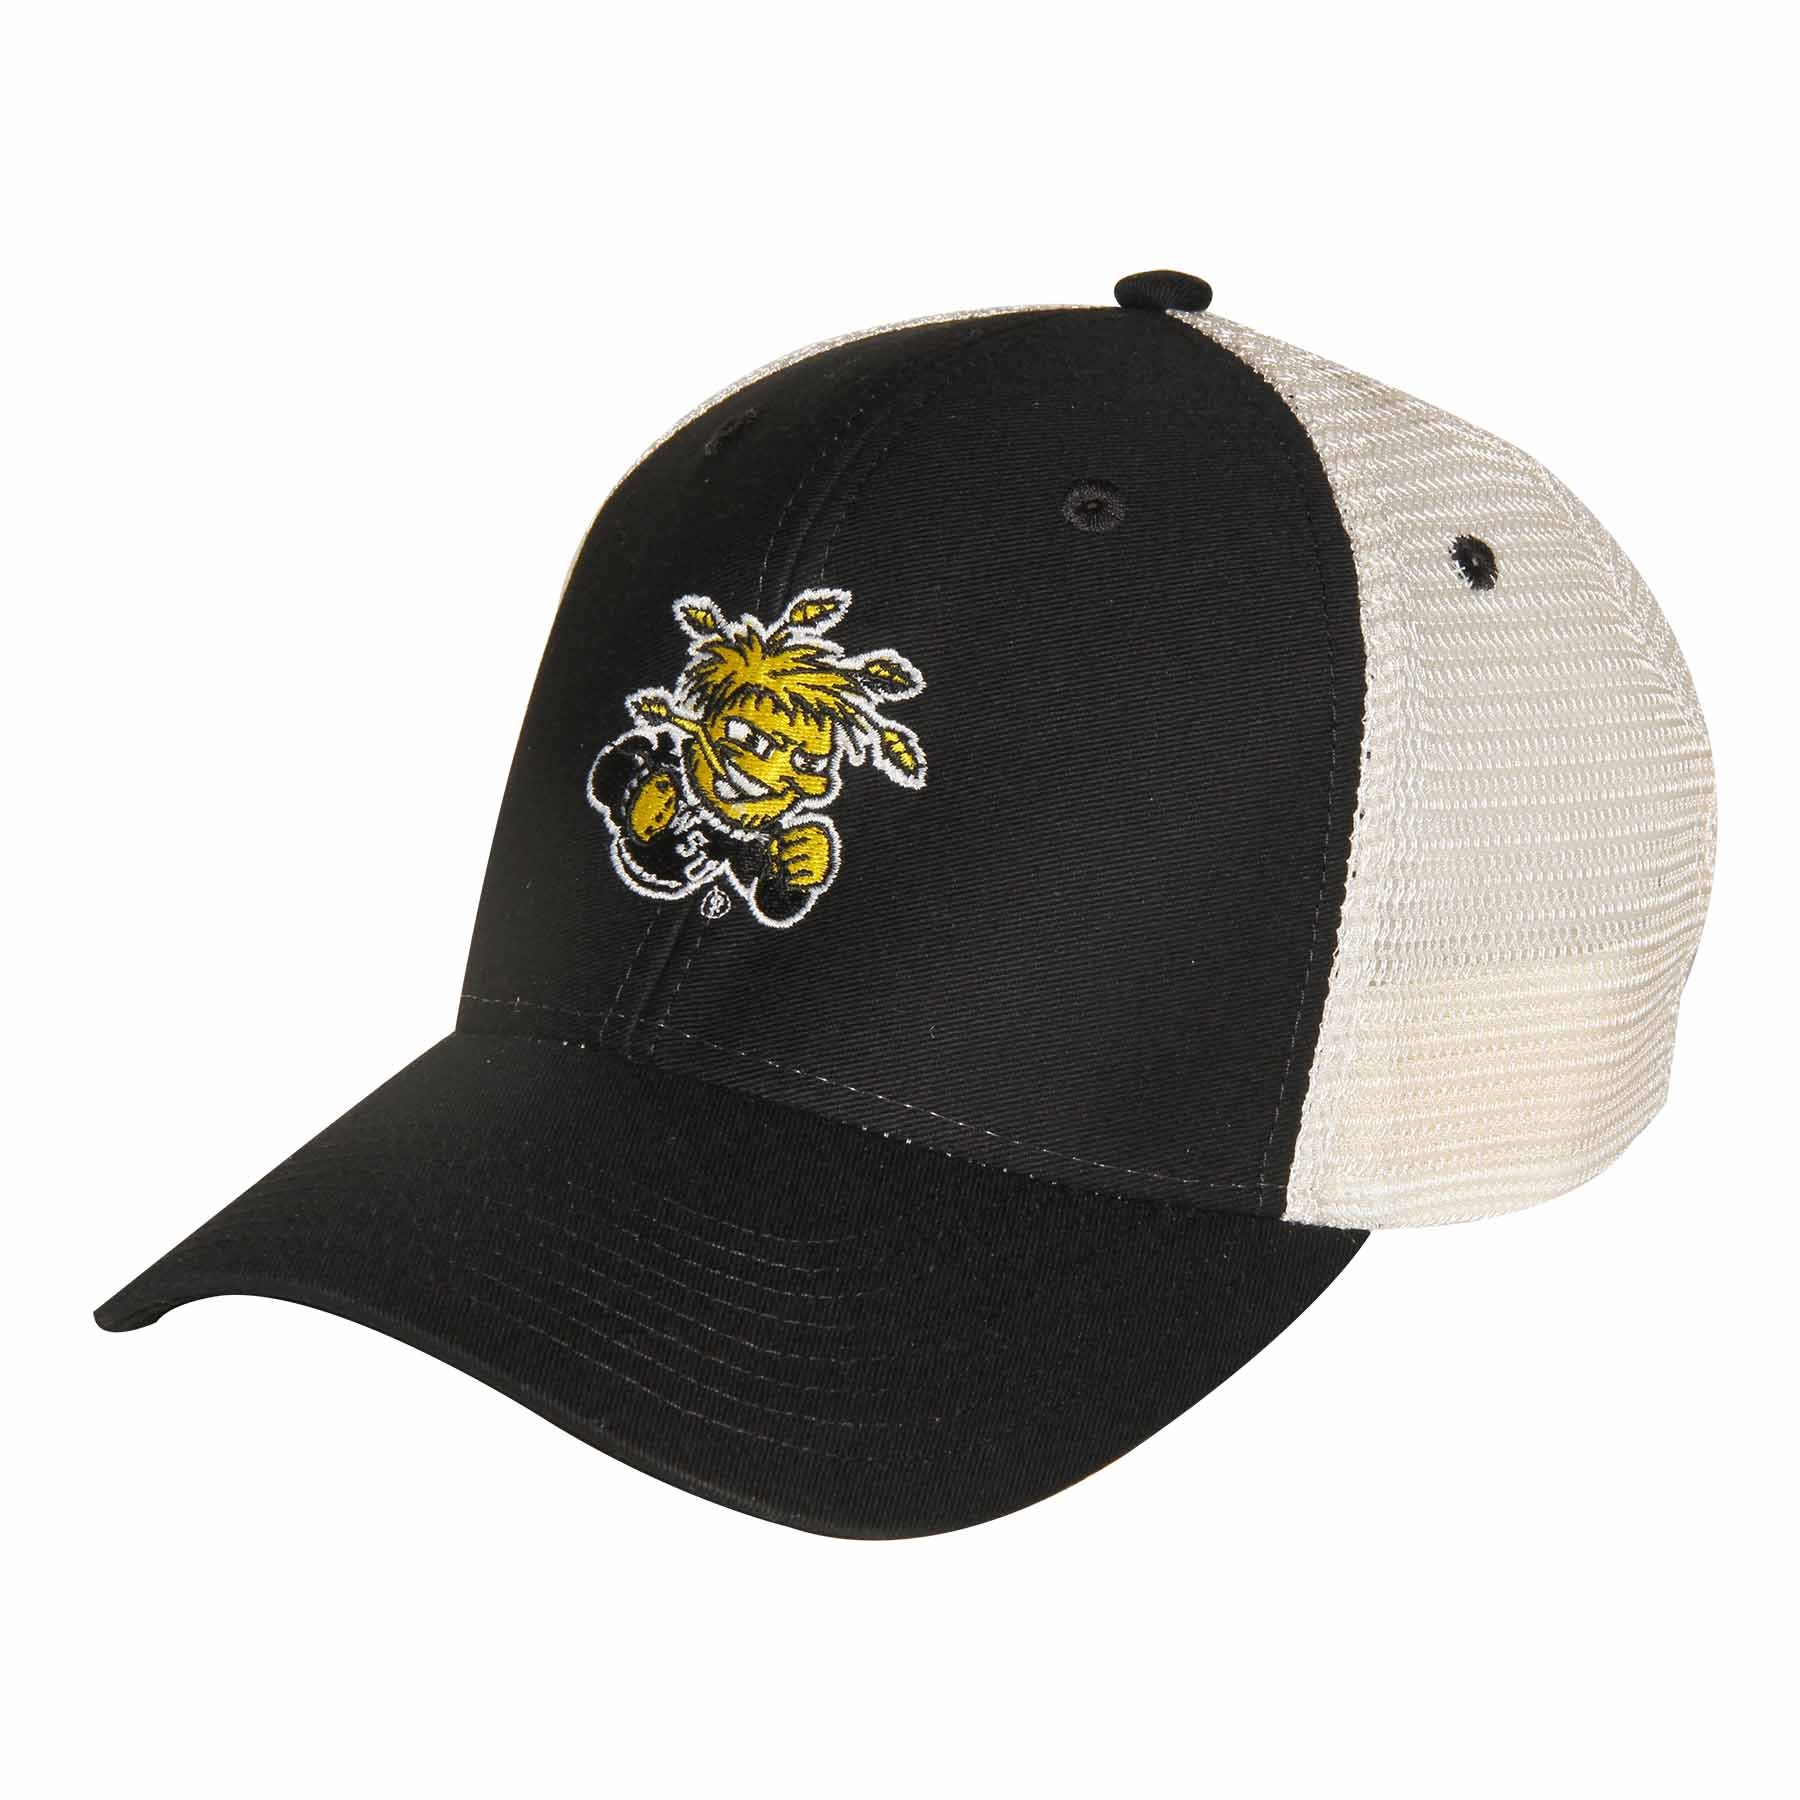 Ouray Sportswear NCAA Unisex-Adult Soft Mesh Sideline Cap